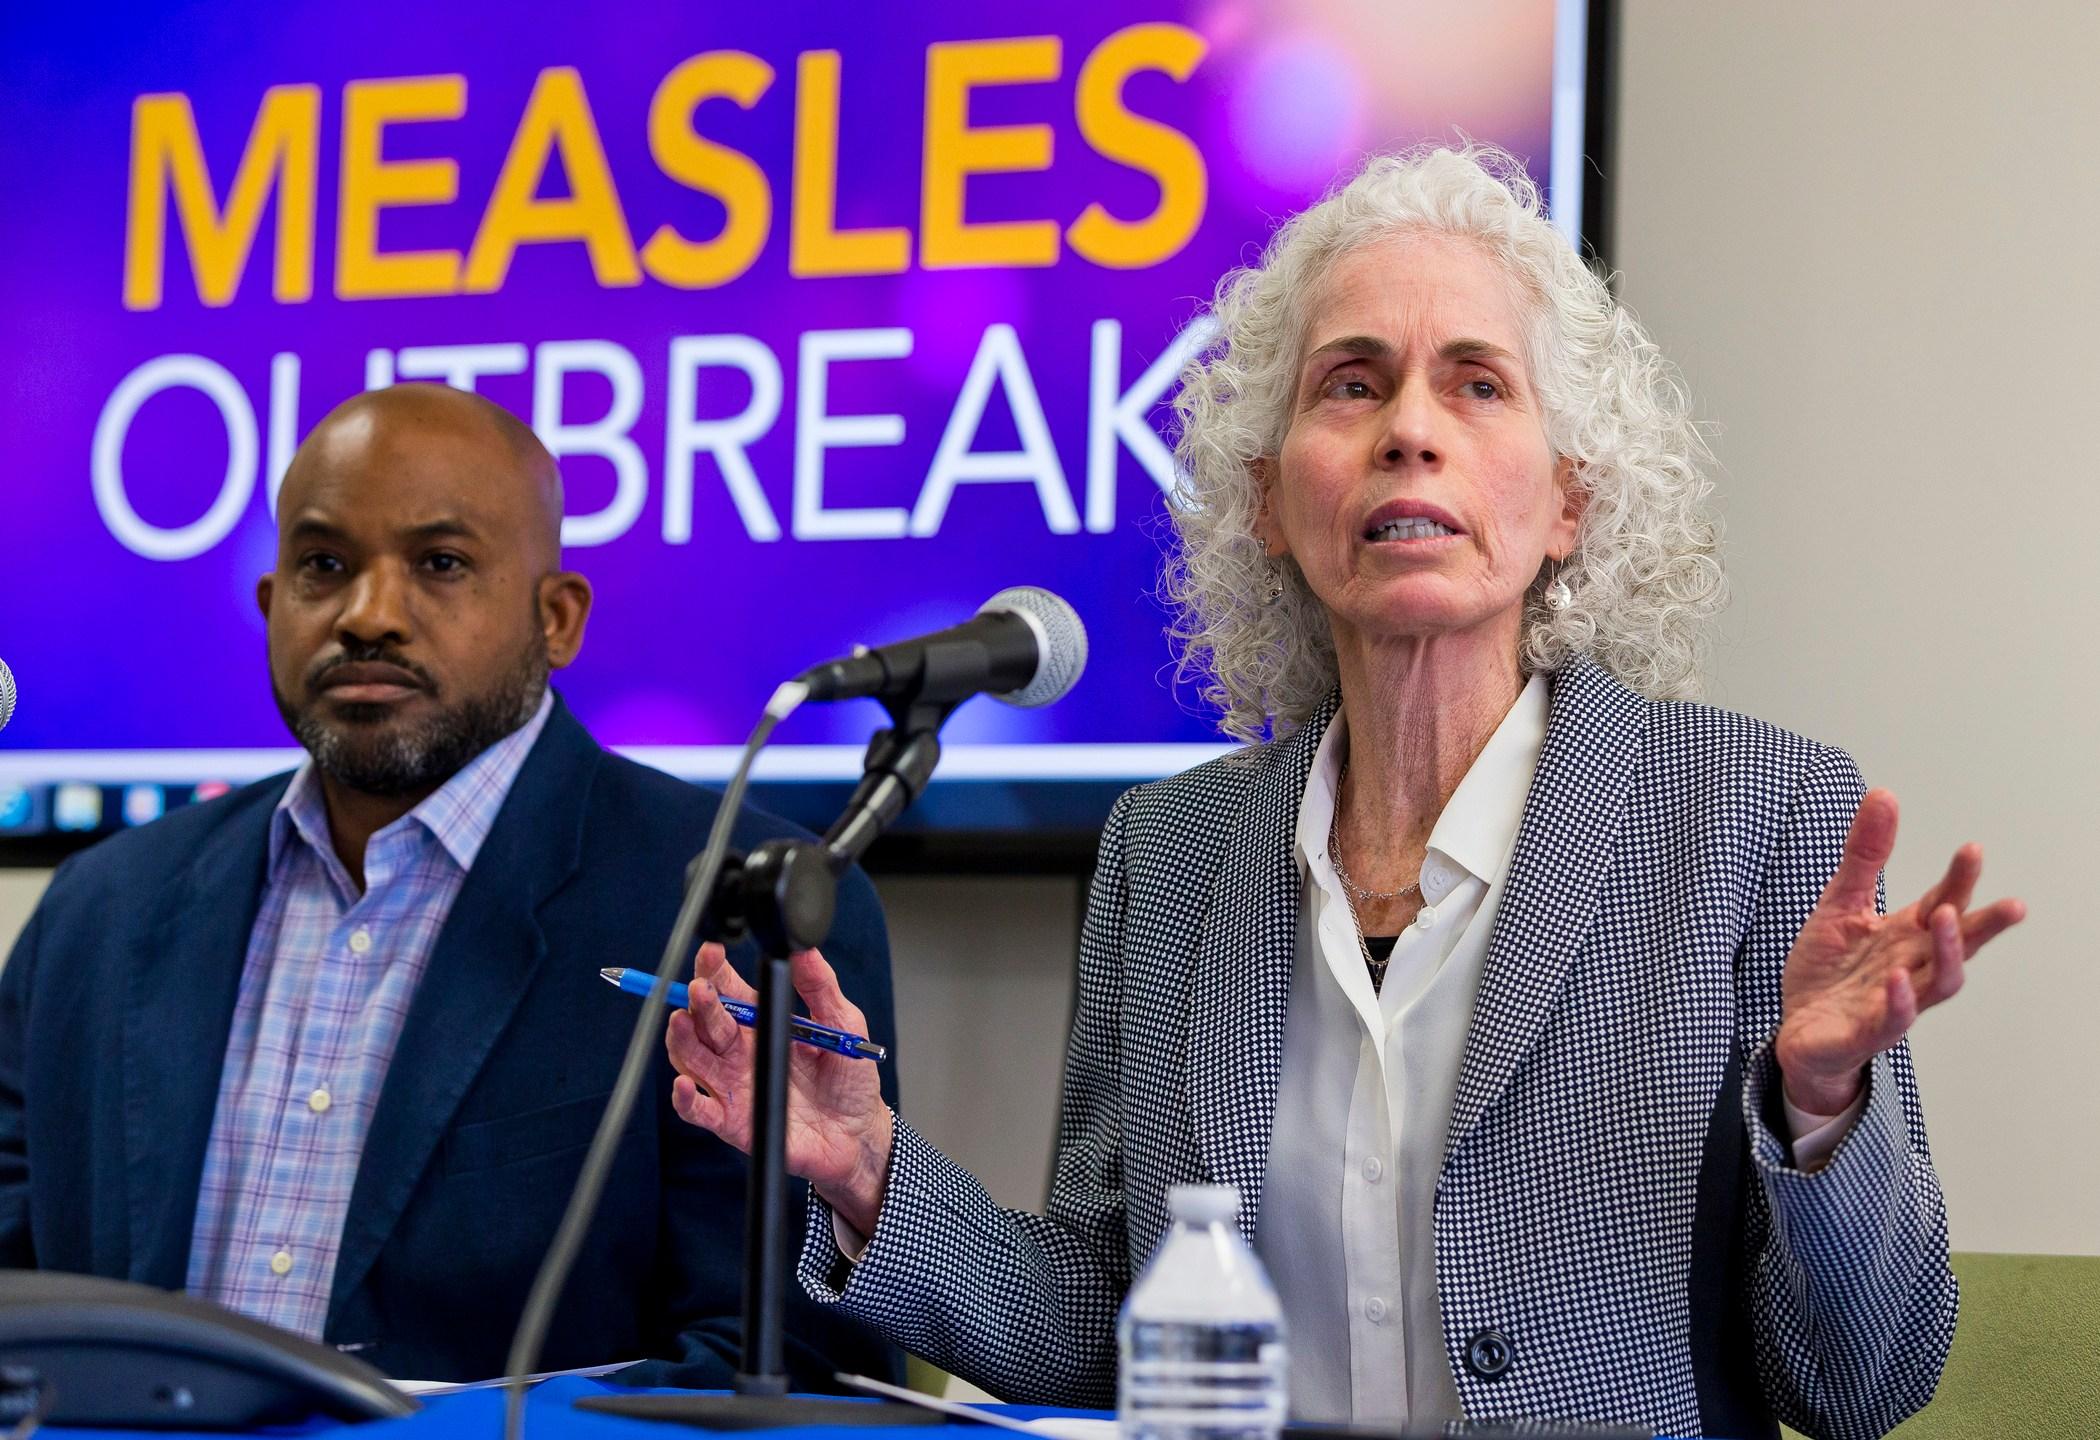 Measles California_1556330292570